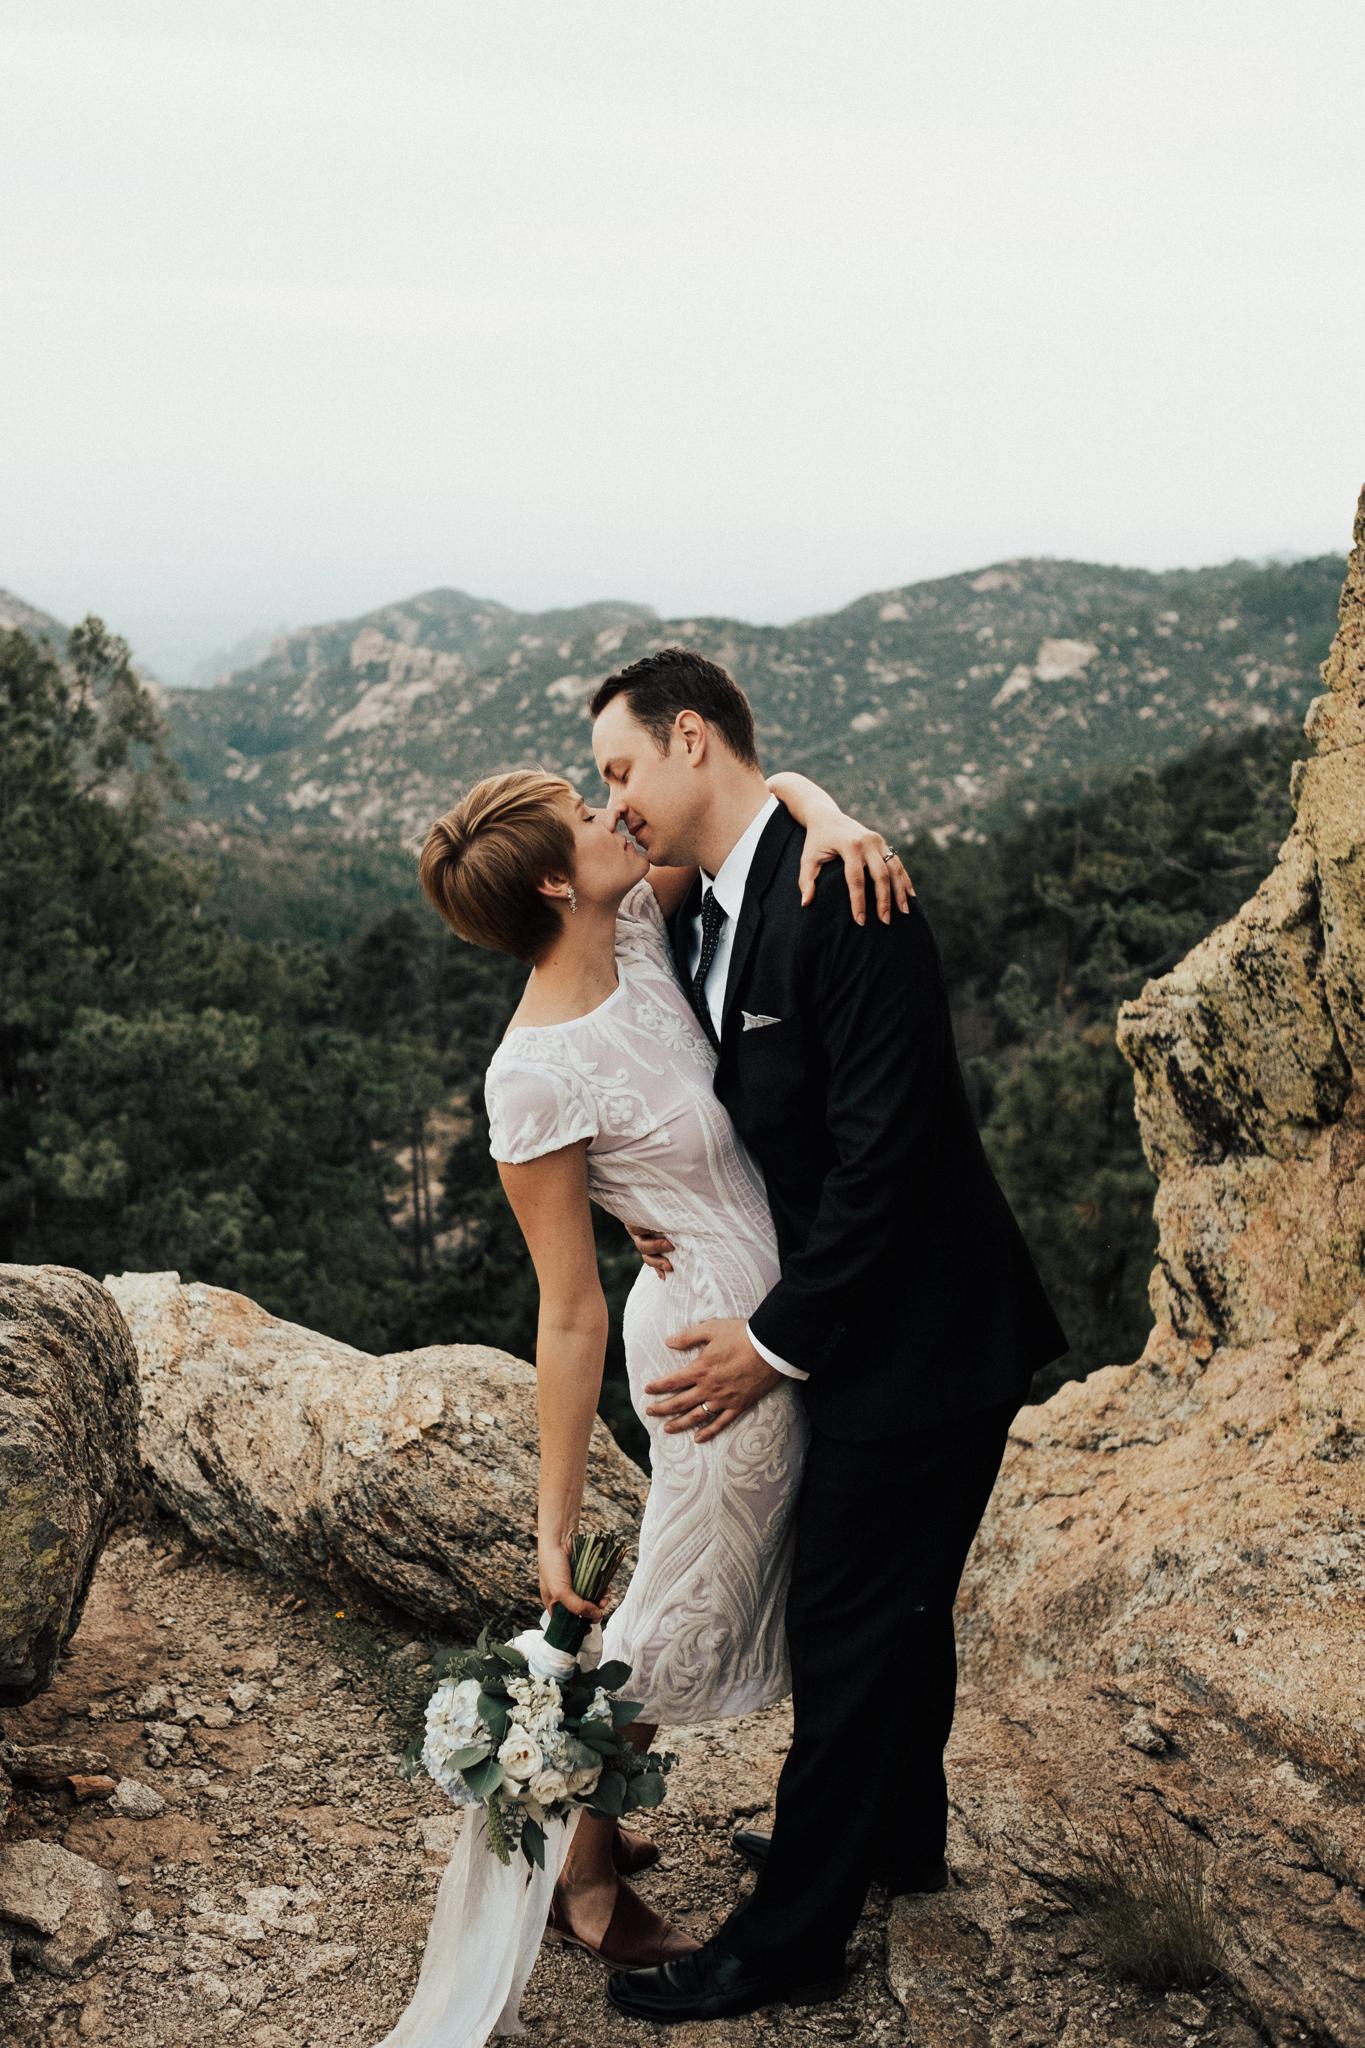 Arizona-Adventure-Elopement-Wedding-Photographer-155.jpg